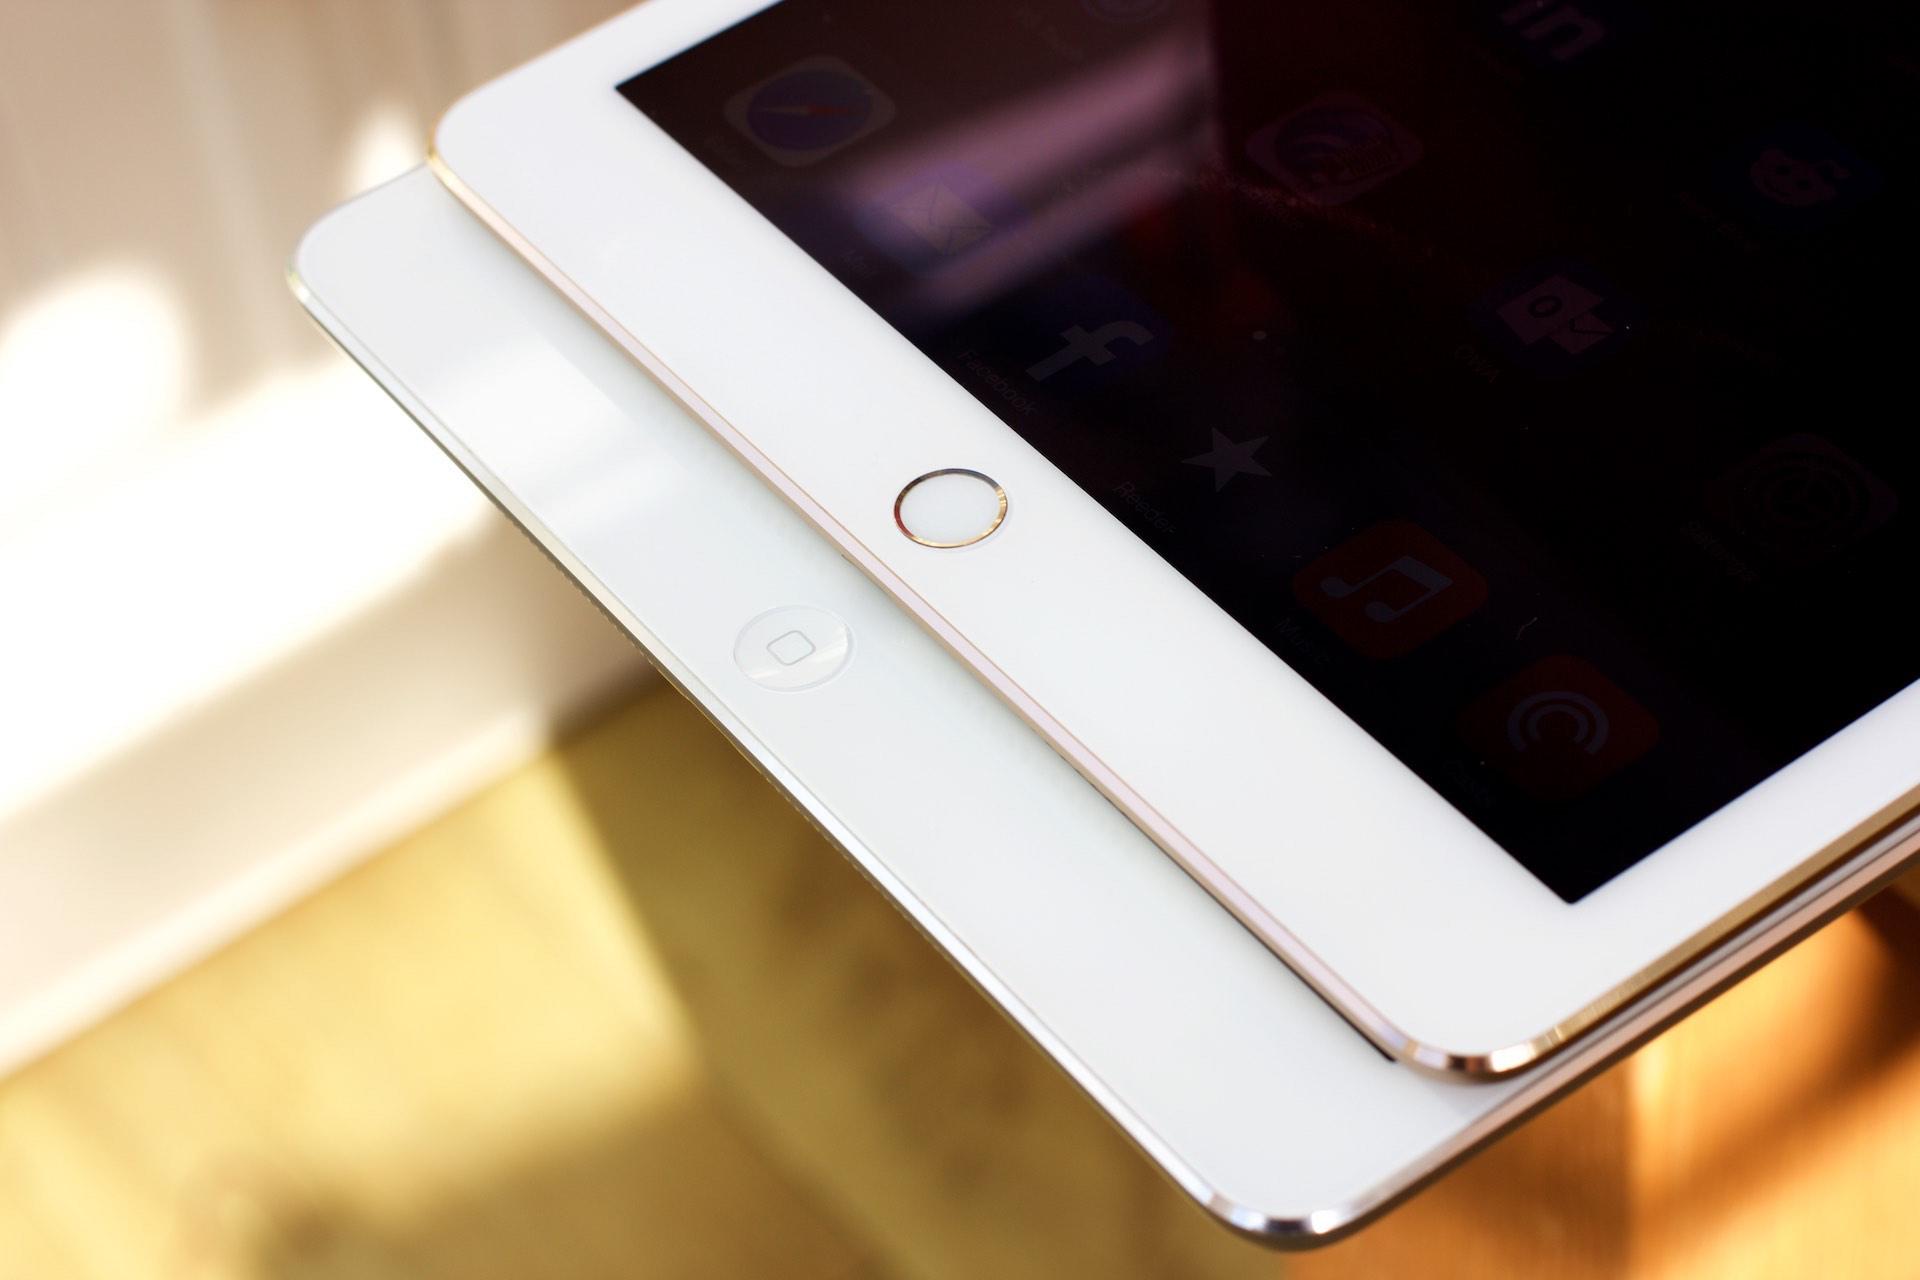 apple-ipad-air-2-review 7.jpg